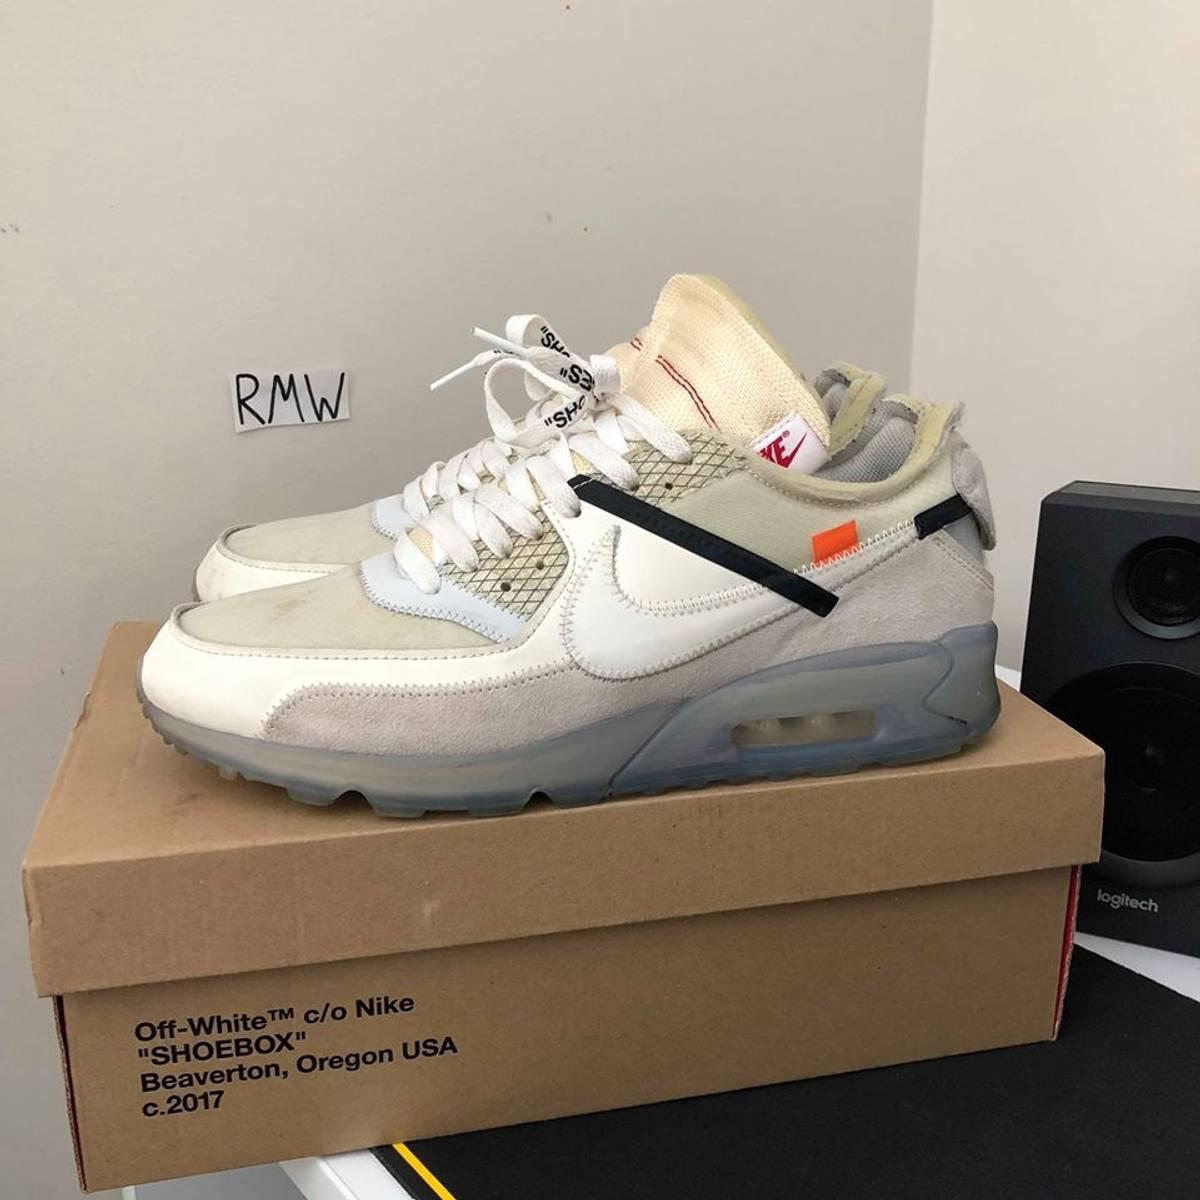 Nike Nike Off White Air Max 90 Size 11 $650